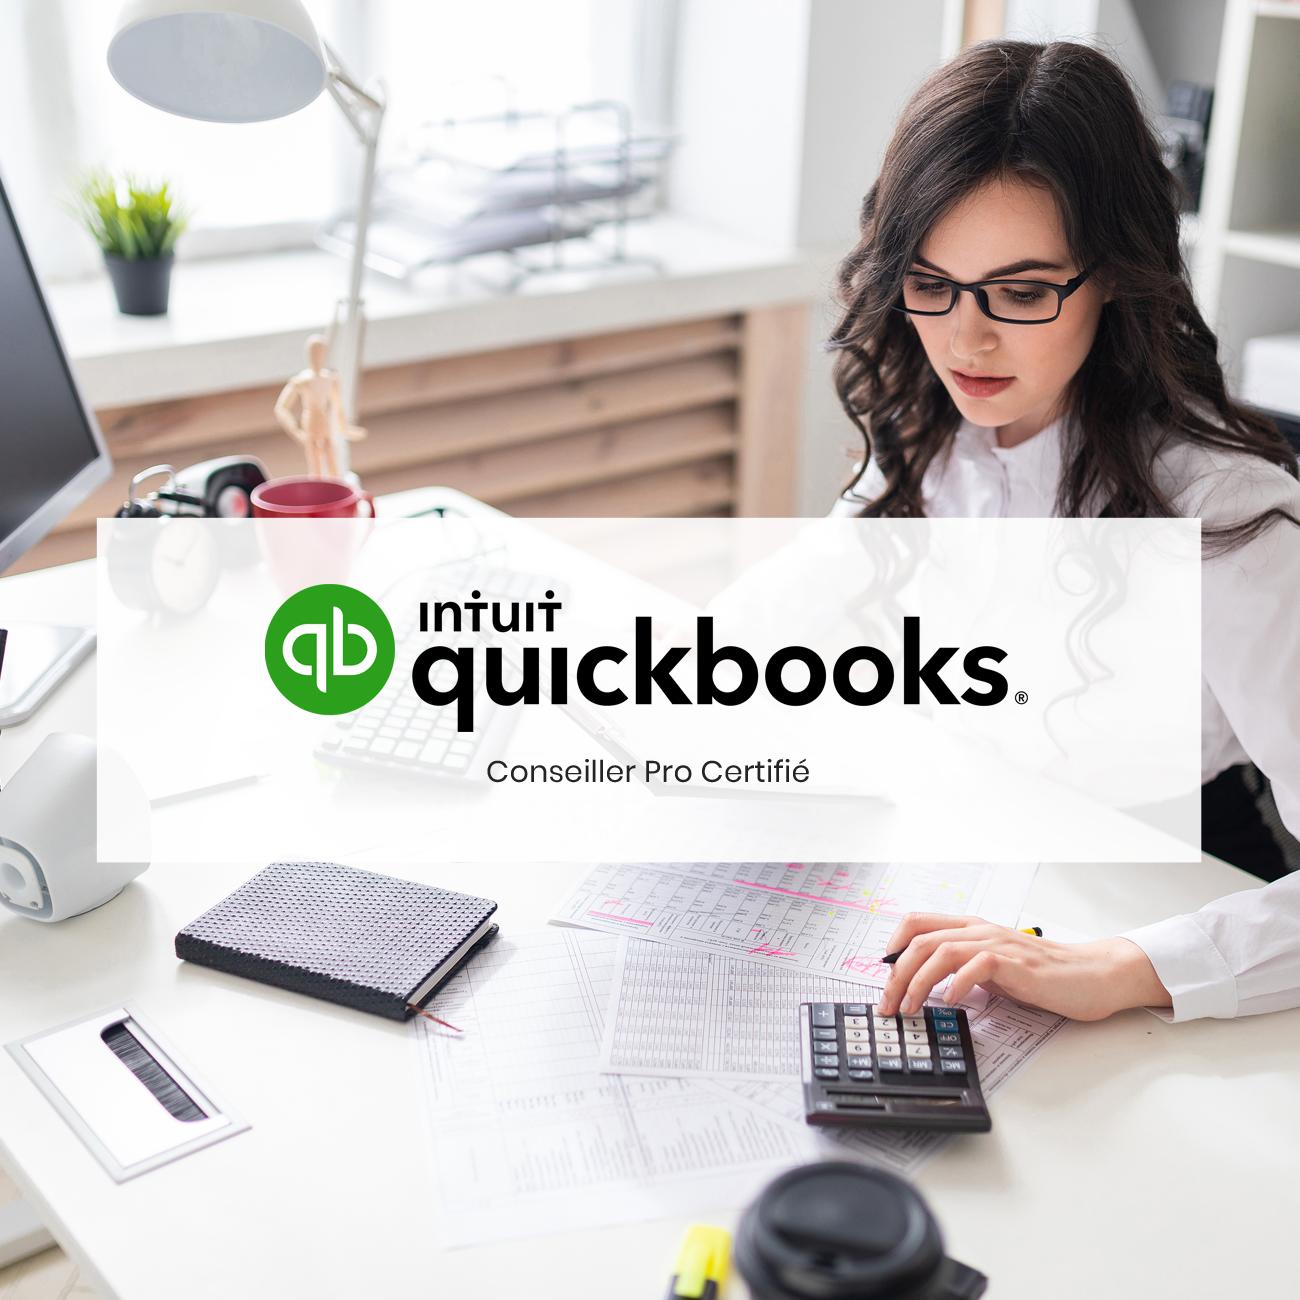 Stratèges VIP est conseiller pro Quickbooks